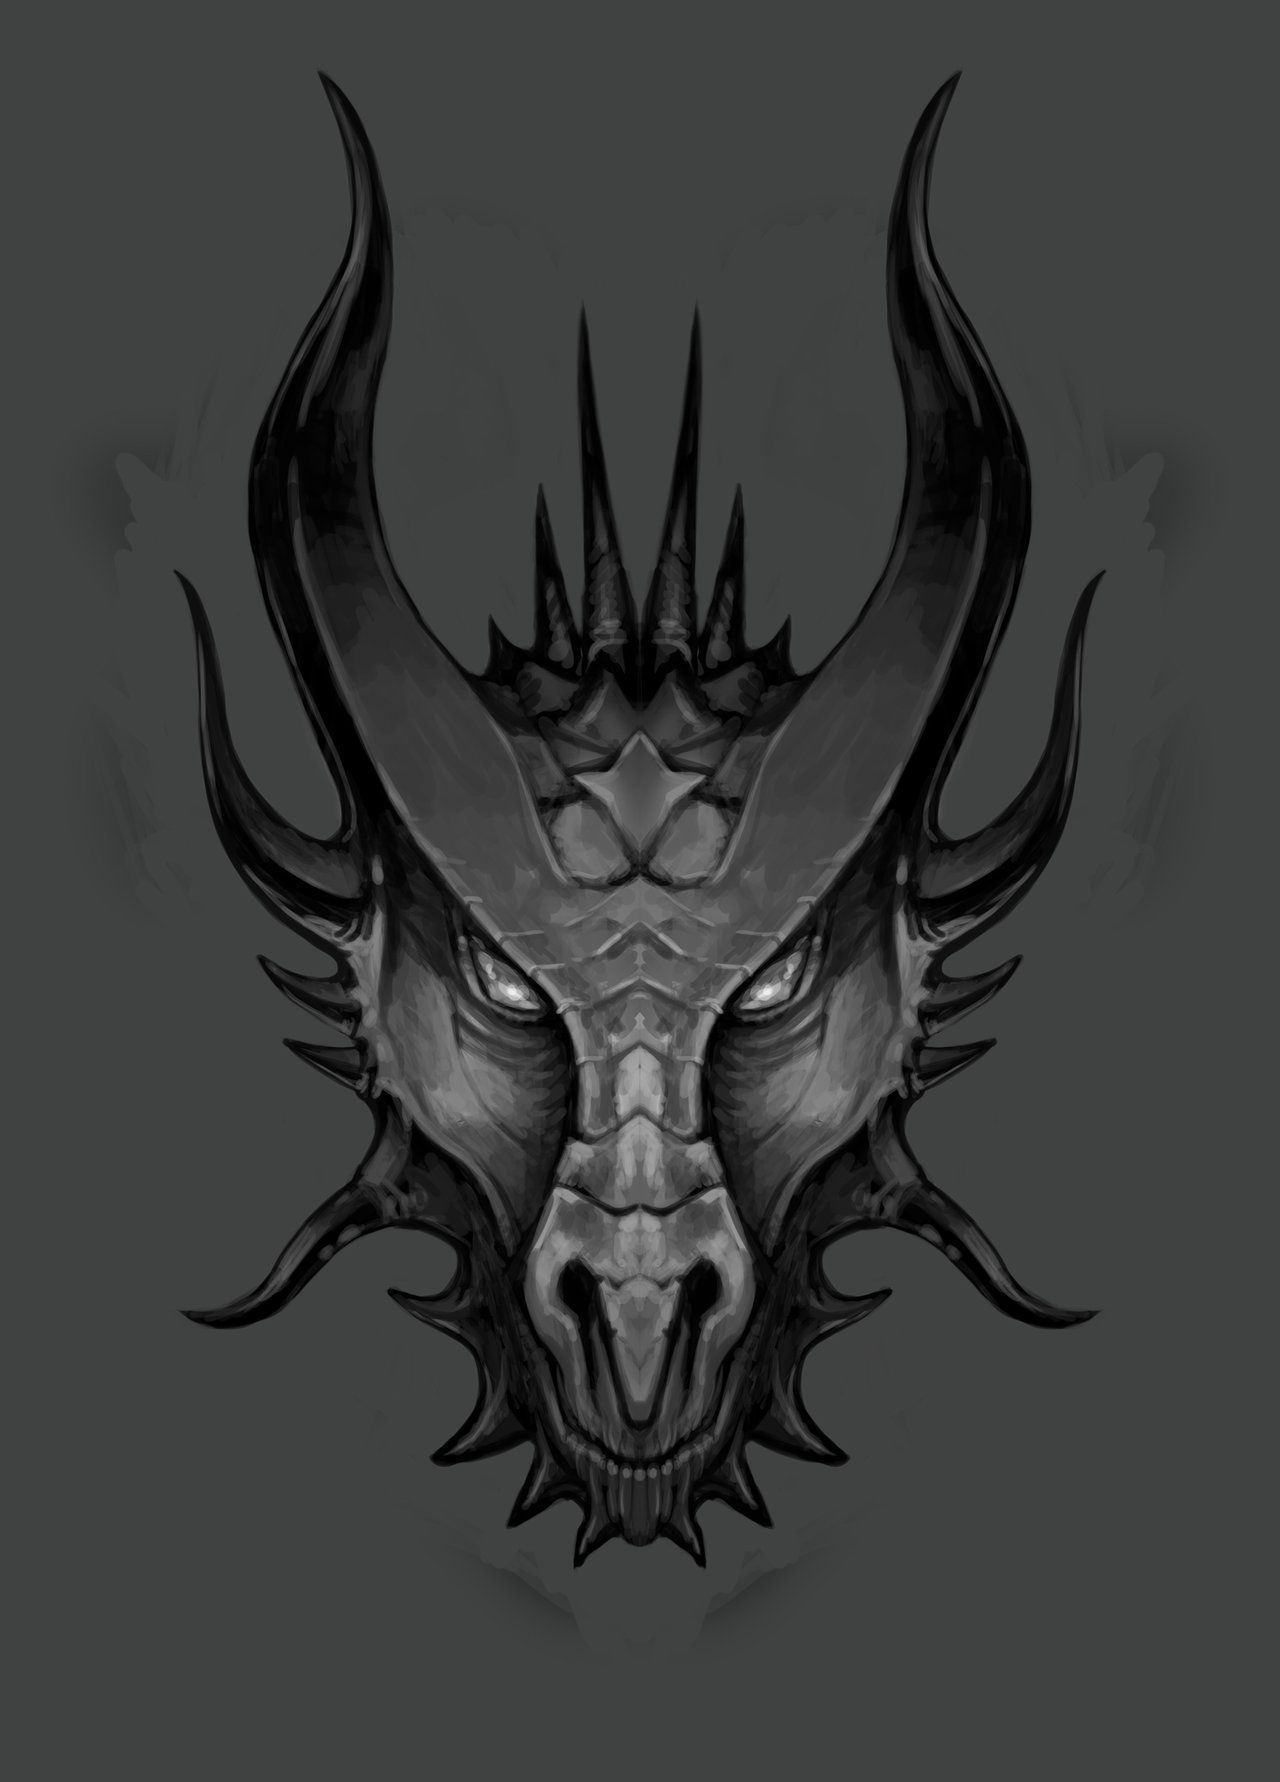 Pin By Alyssa On Dragons Dragon Face Dragon Head Tattoo Dragon Head